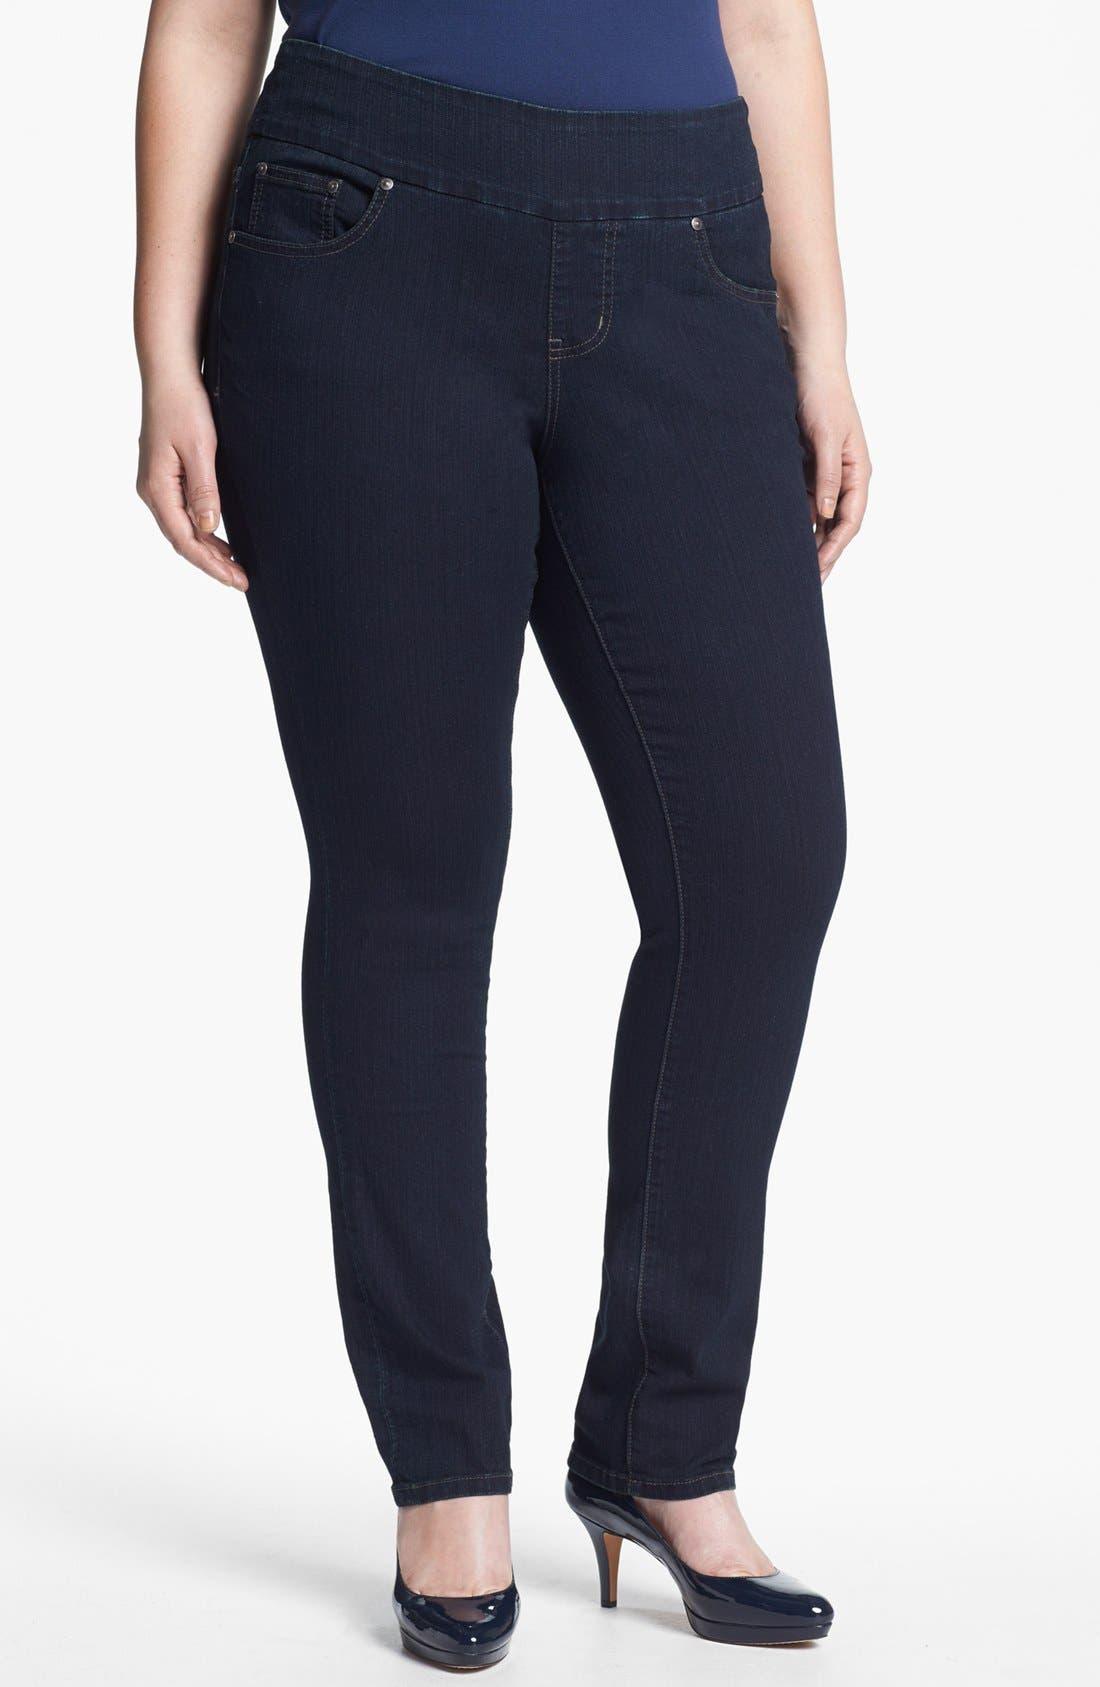 Alternate Image 1 Selected - Jag Jeans 'Malia' Slim Leg Jeans (Plus Size)